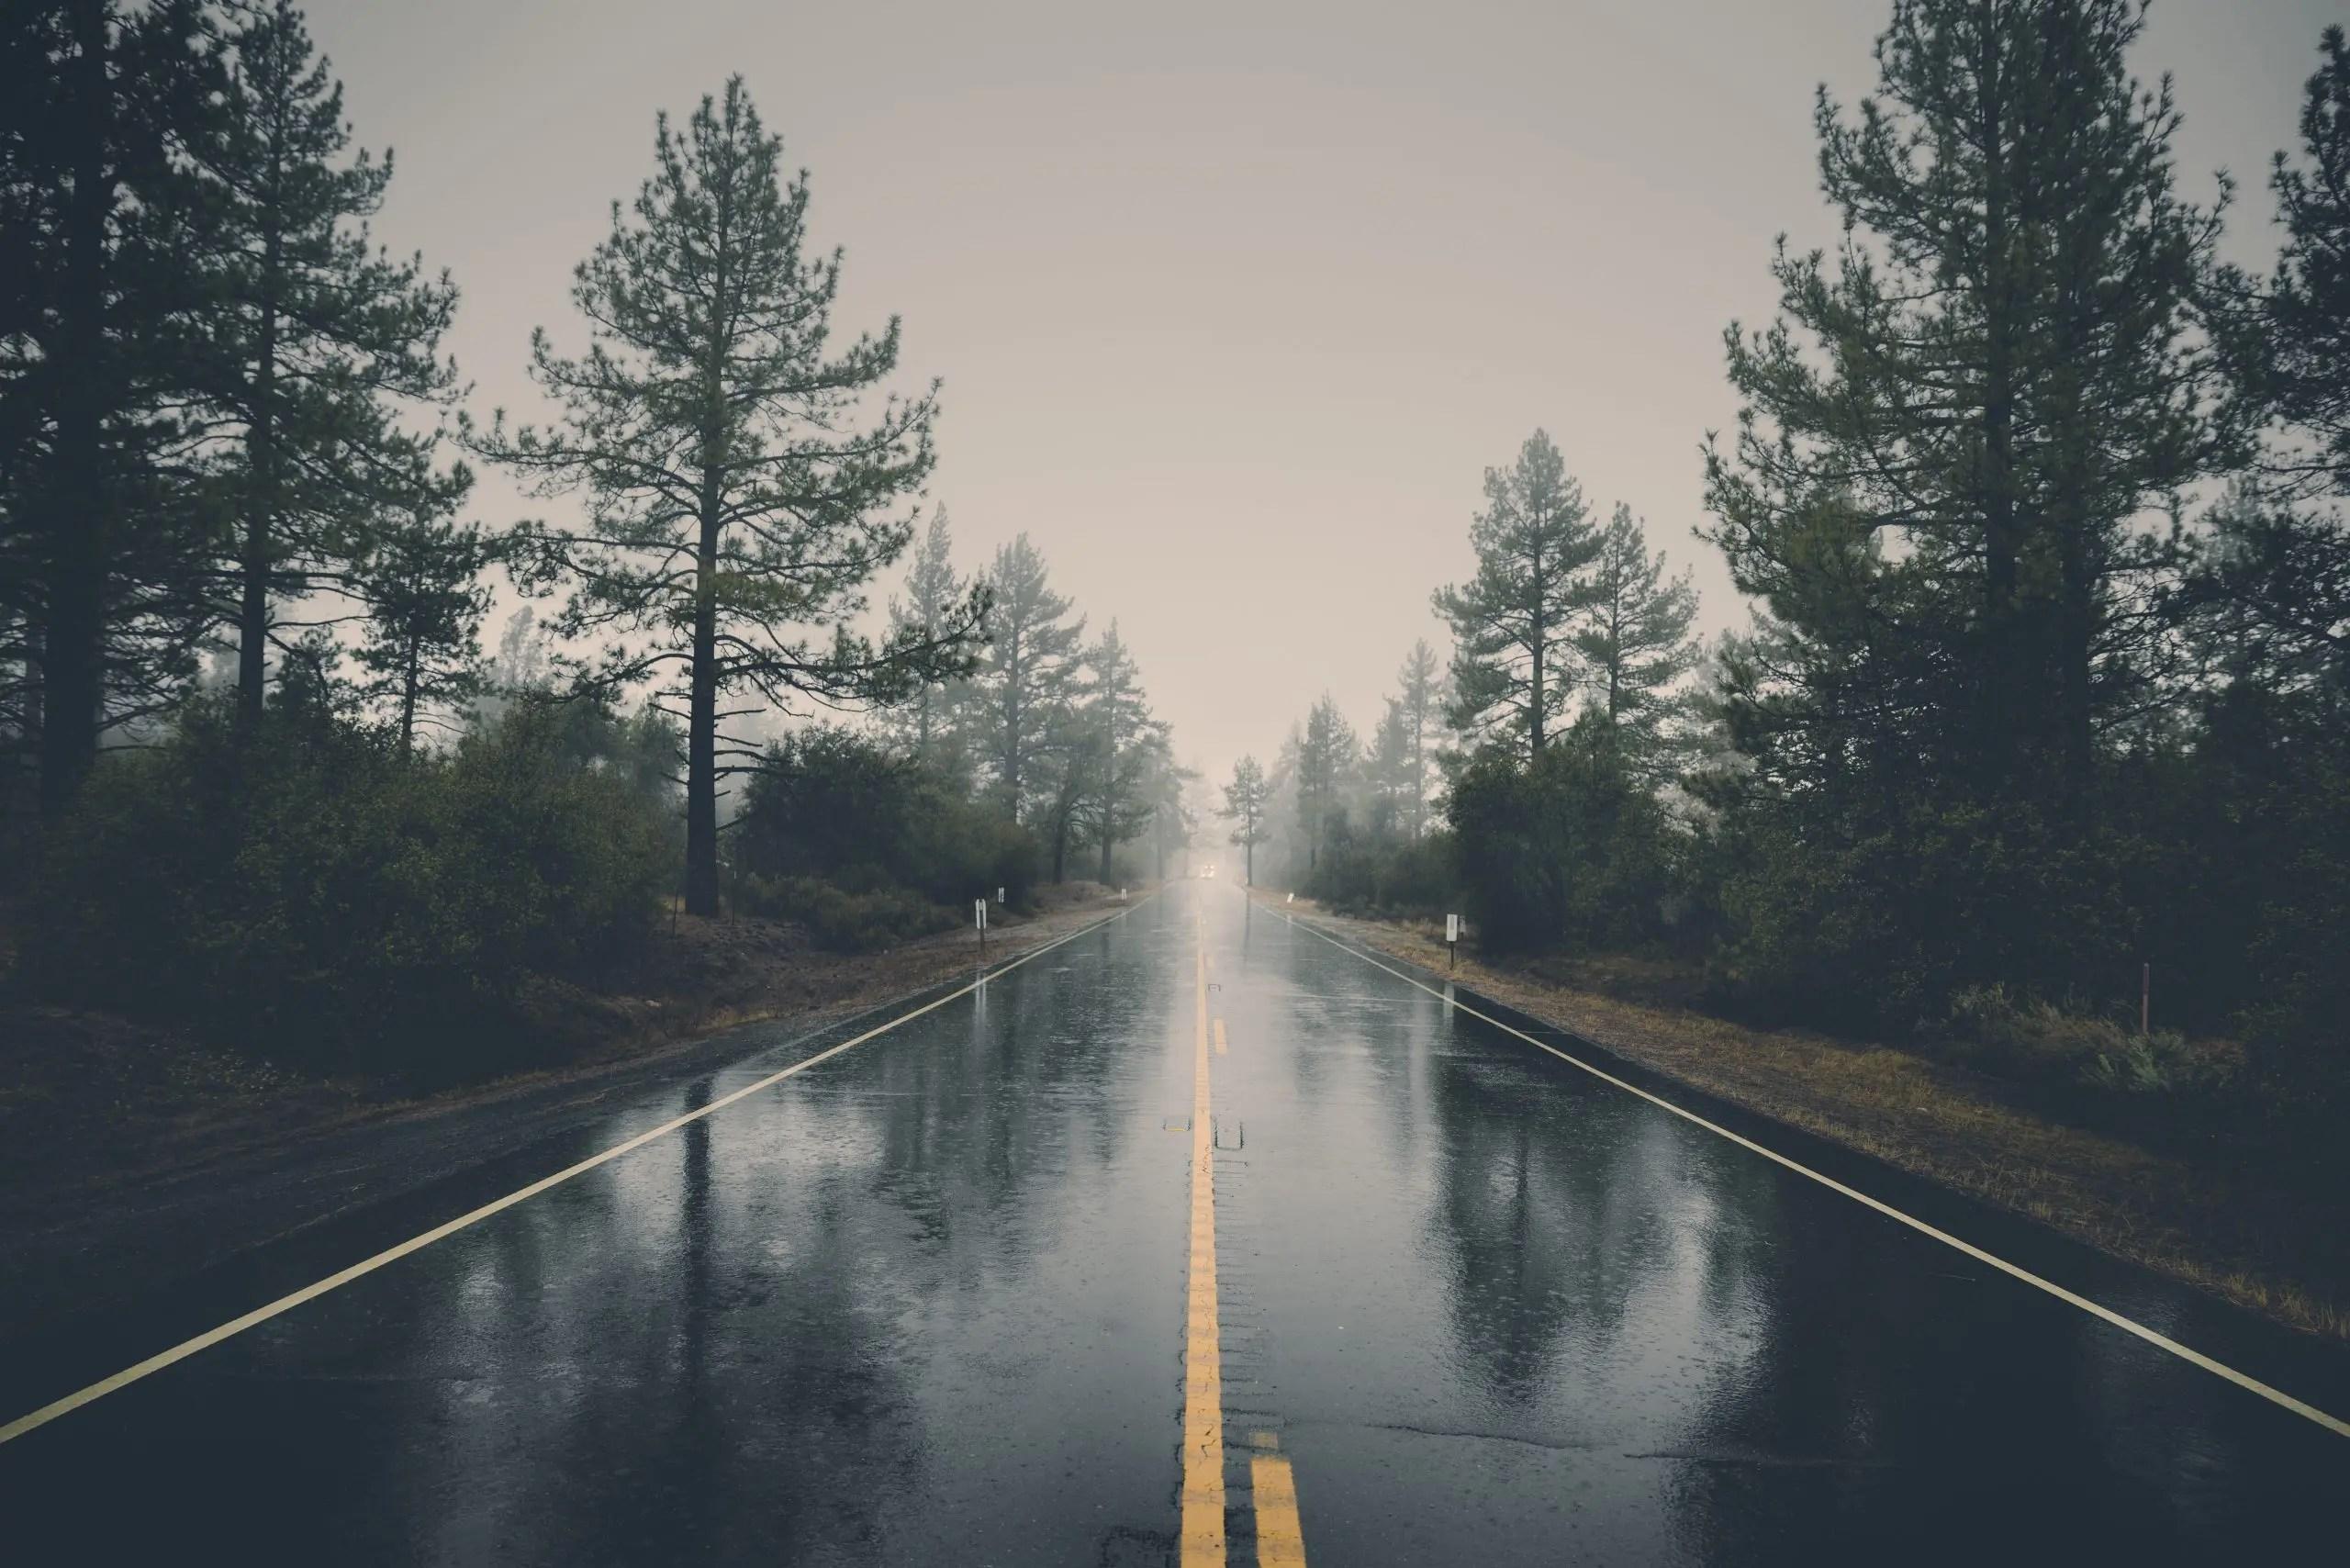 road-landscape-nature-forest-39811